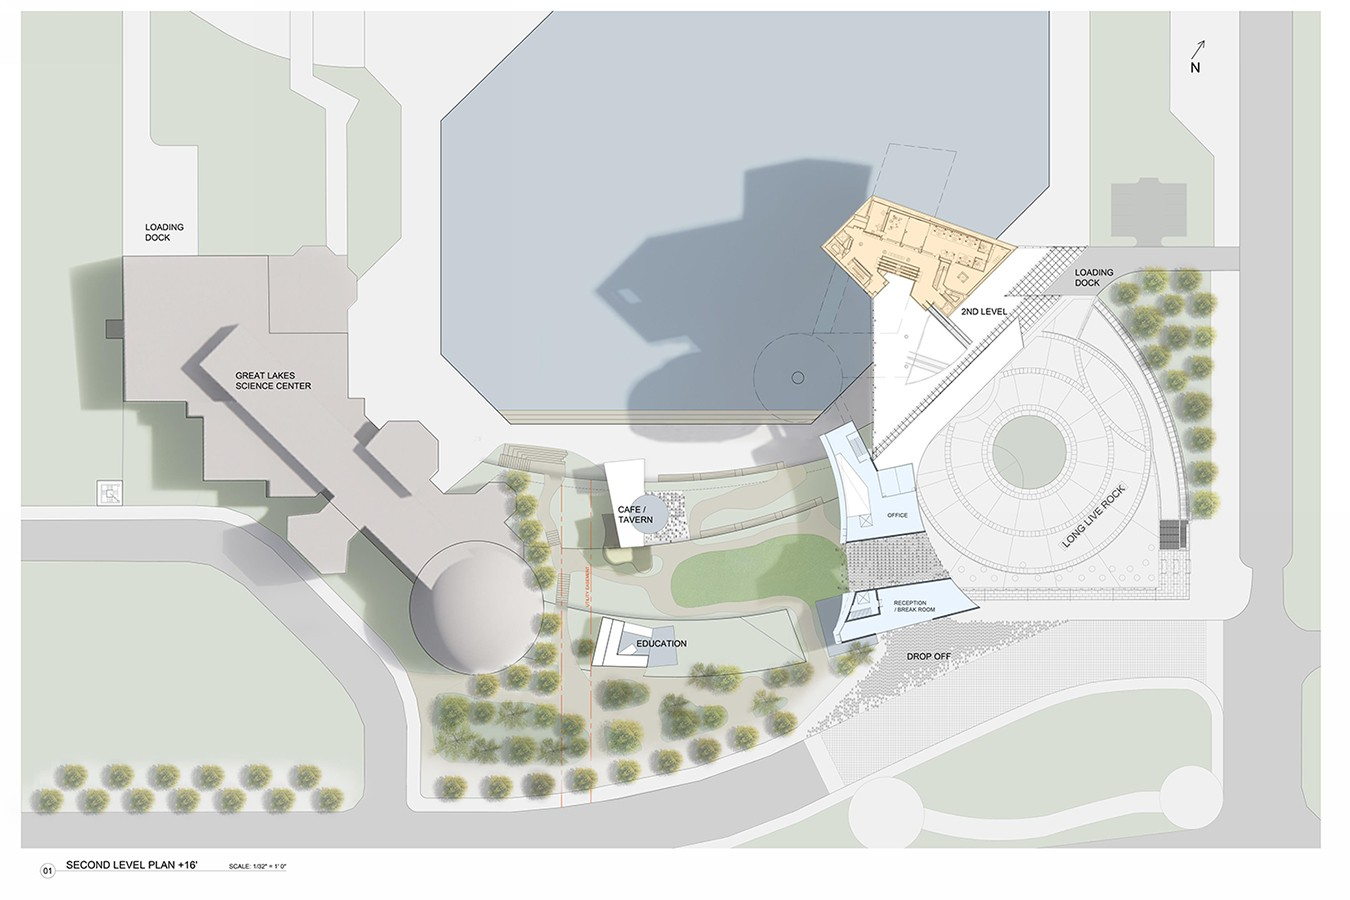 https://stevenholl.sfo2.digitaloceanspaces.com/uploads/projects/project-images/second floor plan.jpg